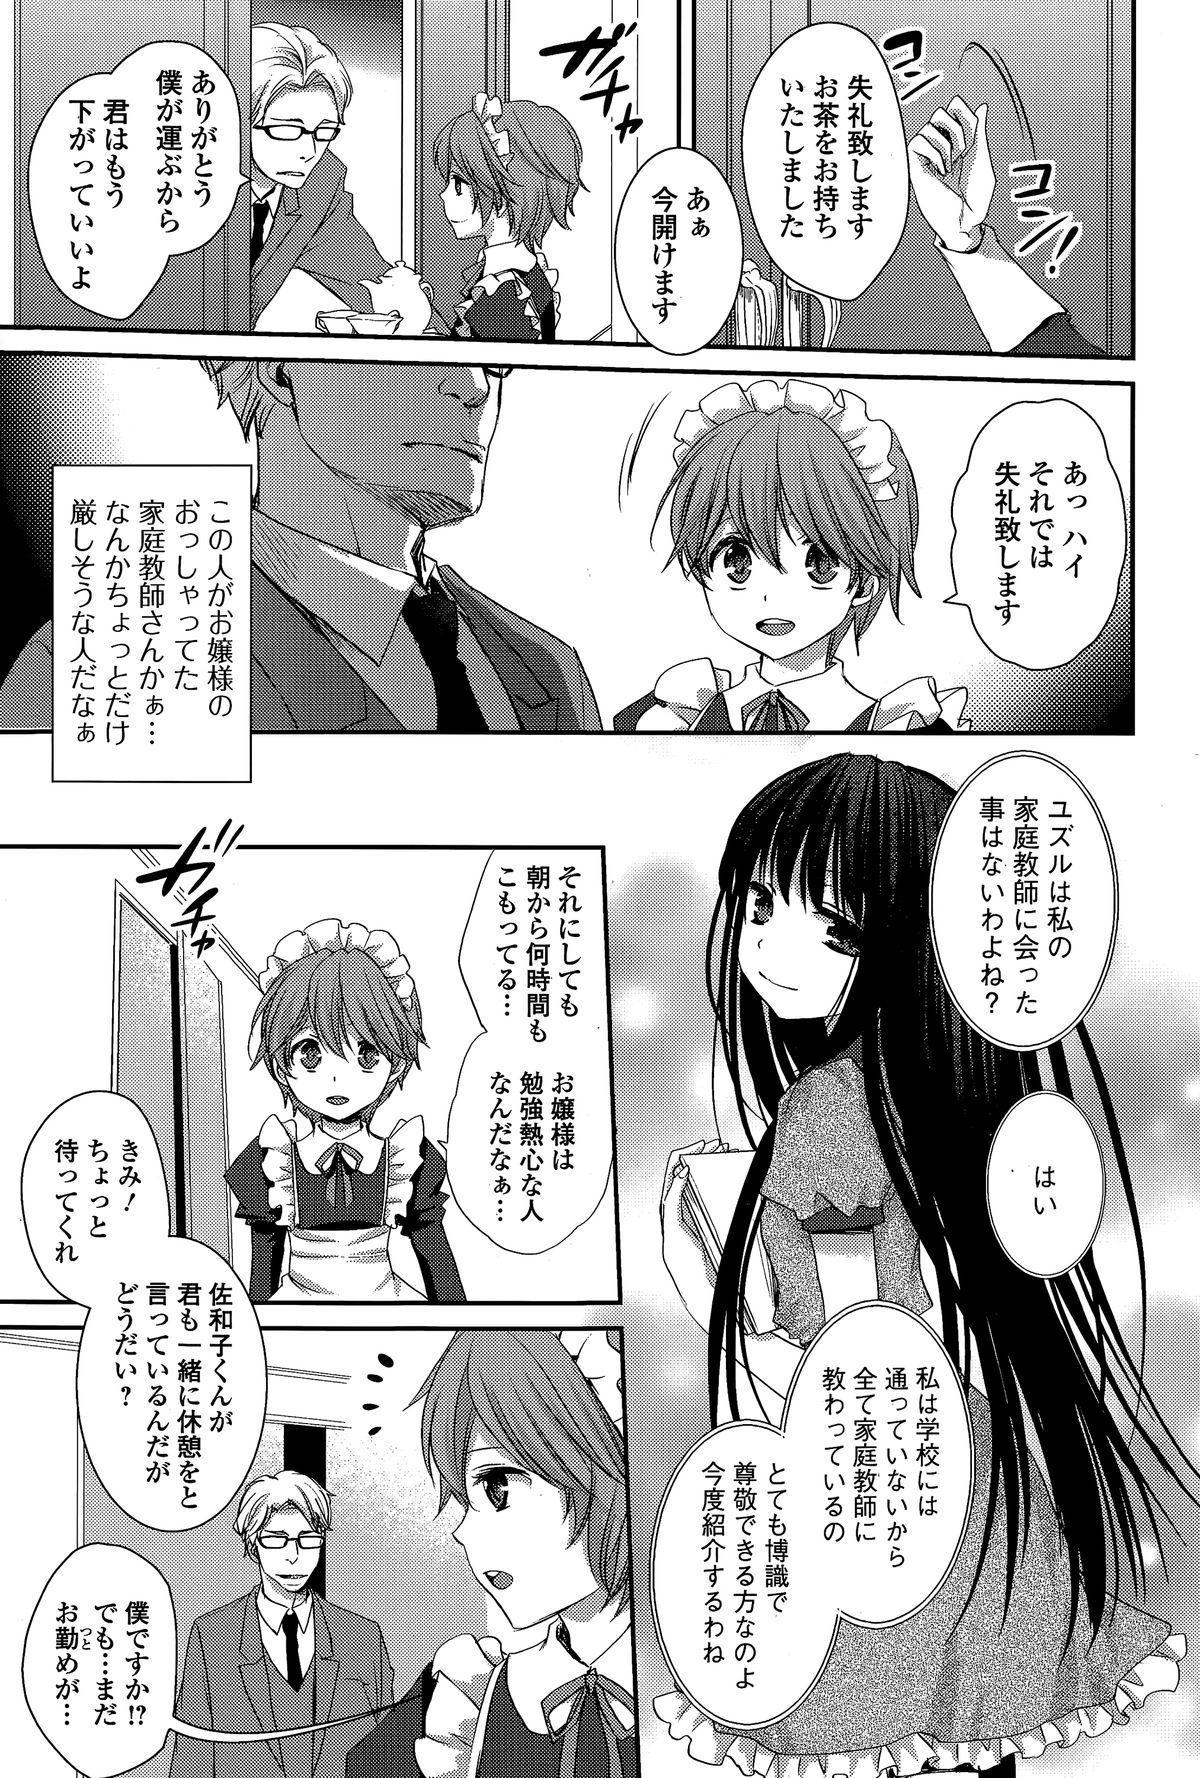 Comic Toutetsu 2015-02 Vol. 3 190